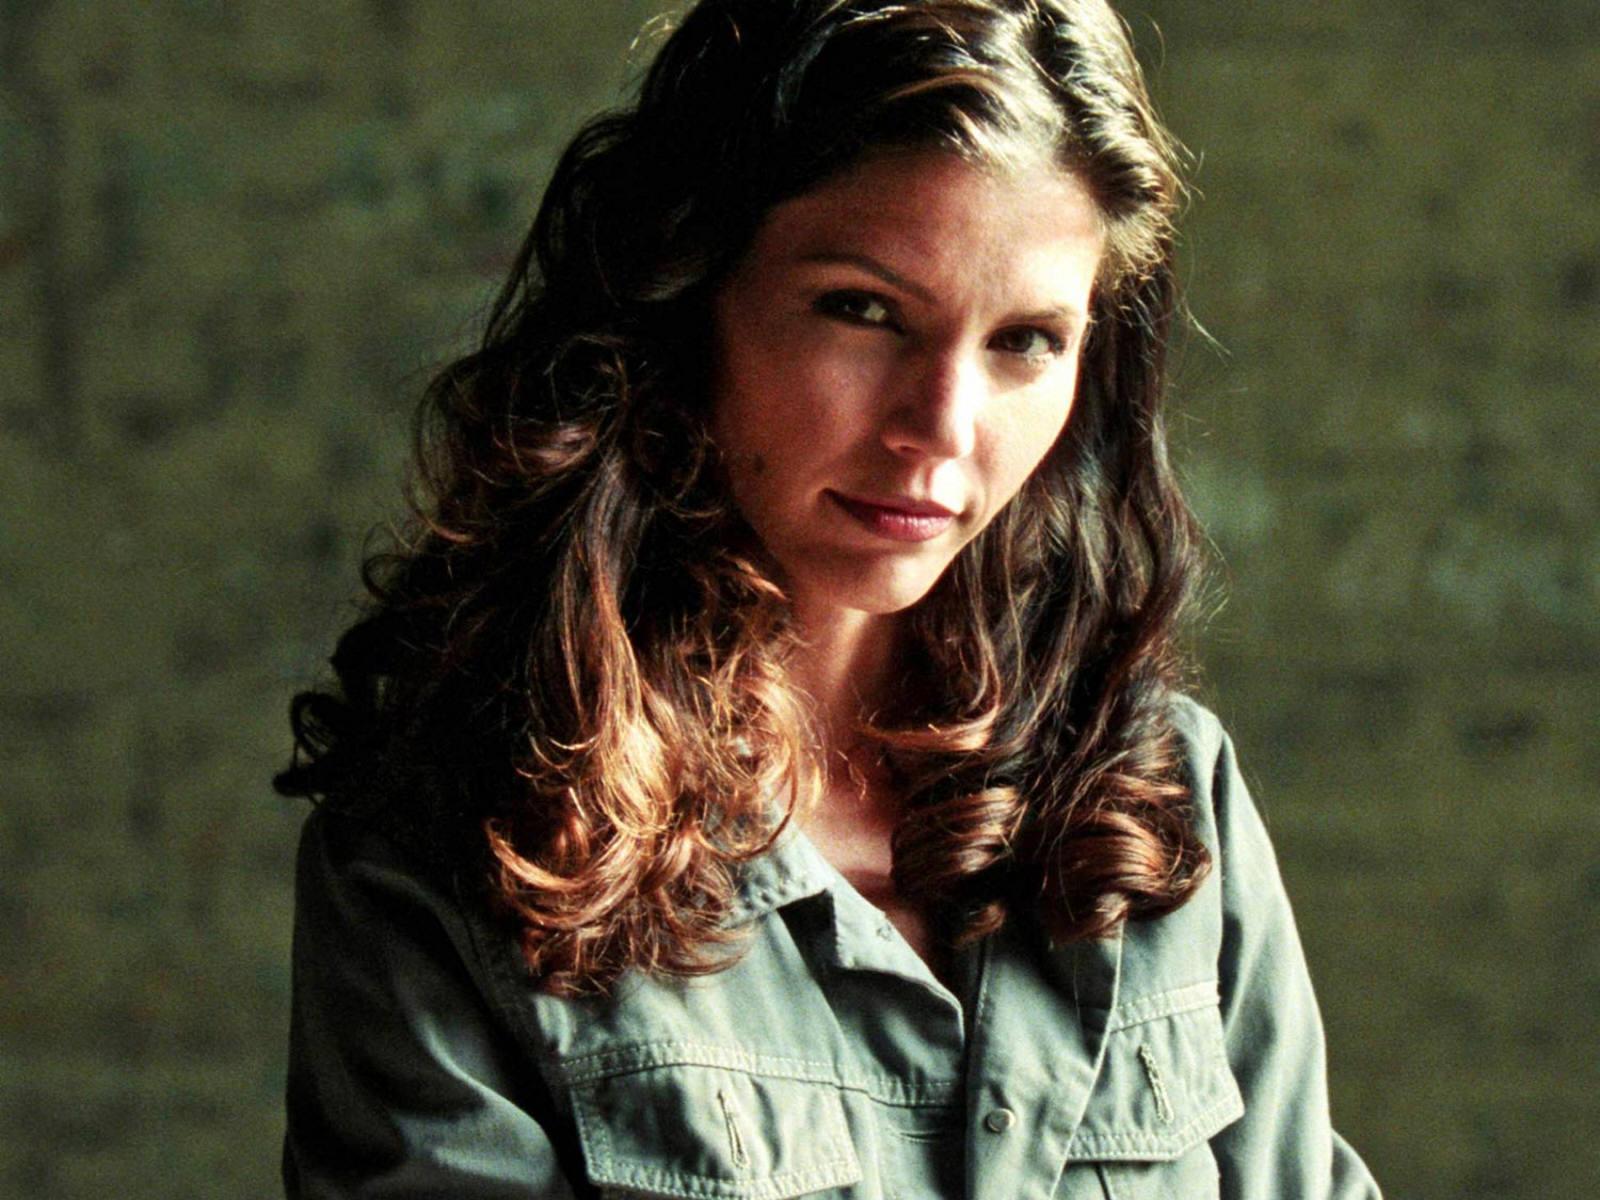 Poze Charisma Carpenter - Actor - Poza 54 din 167 ...